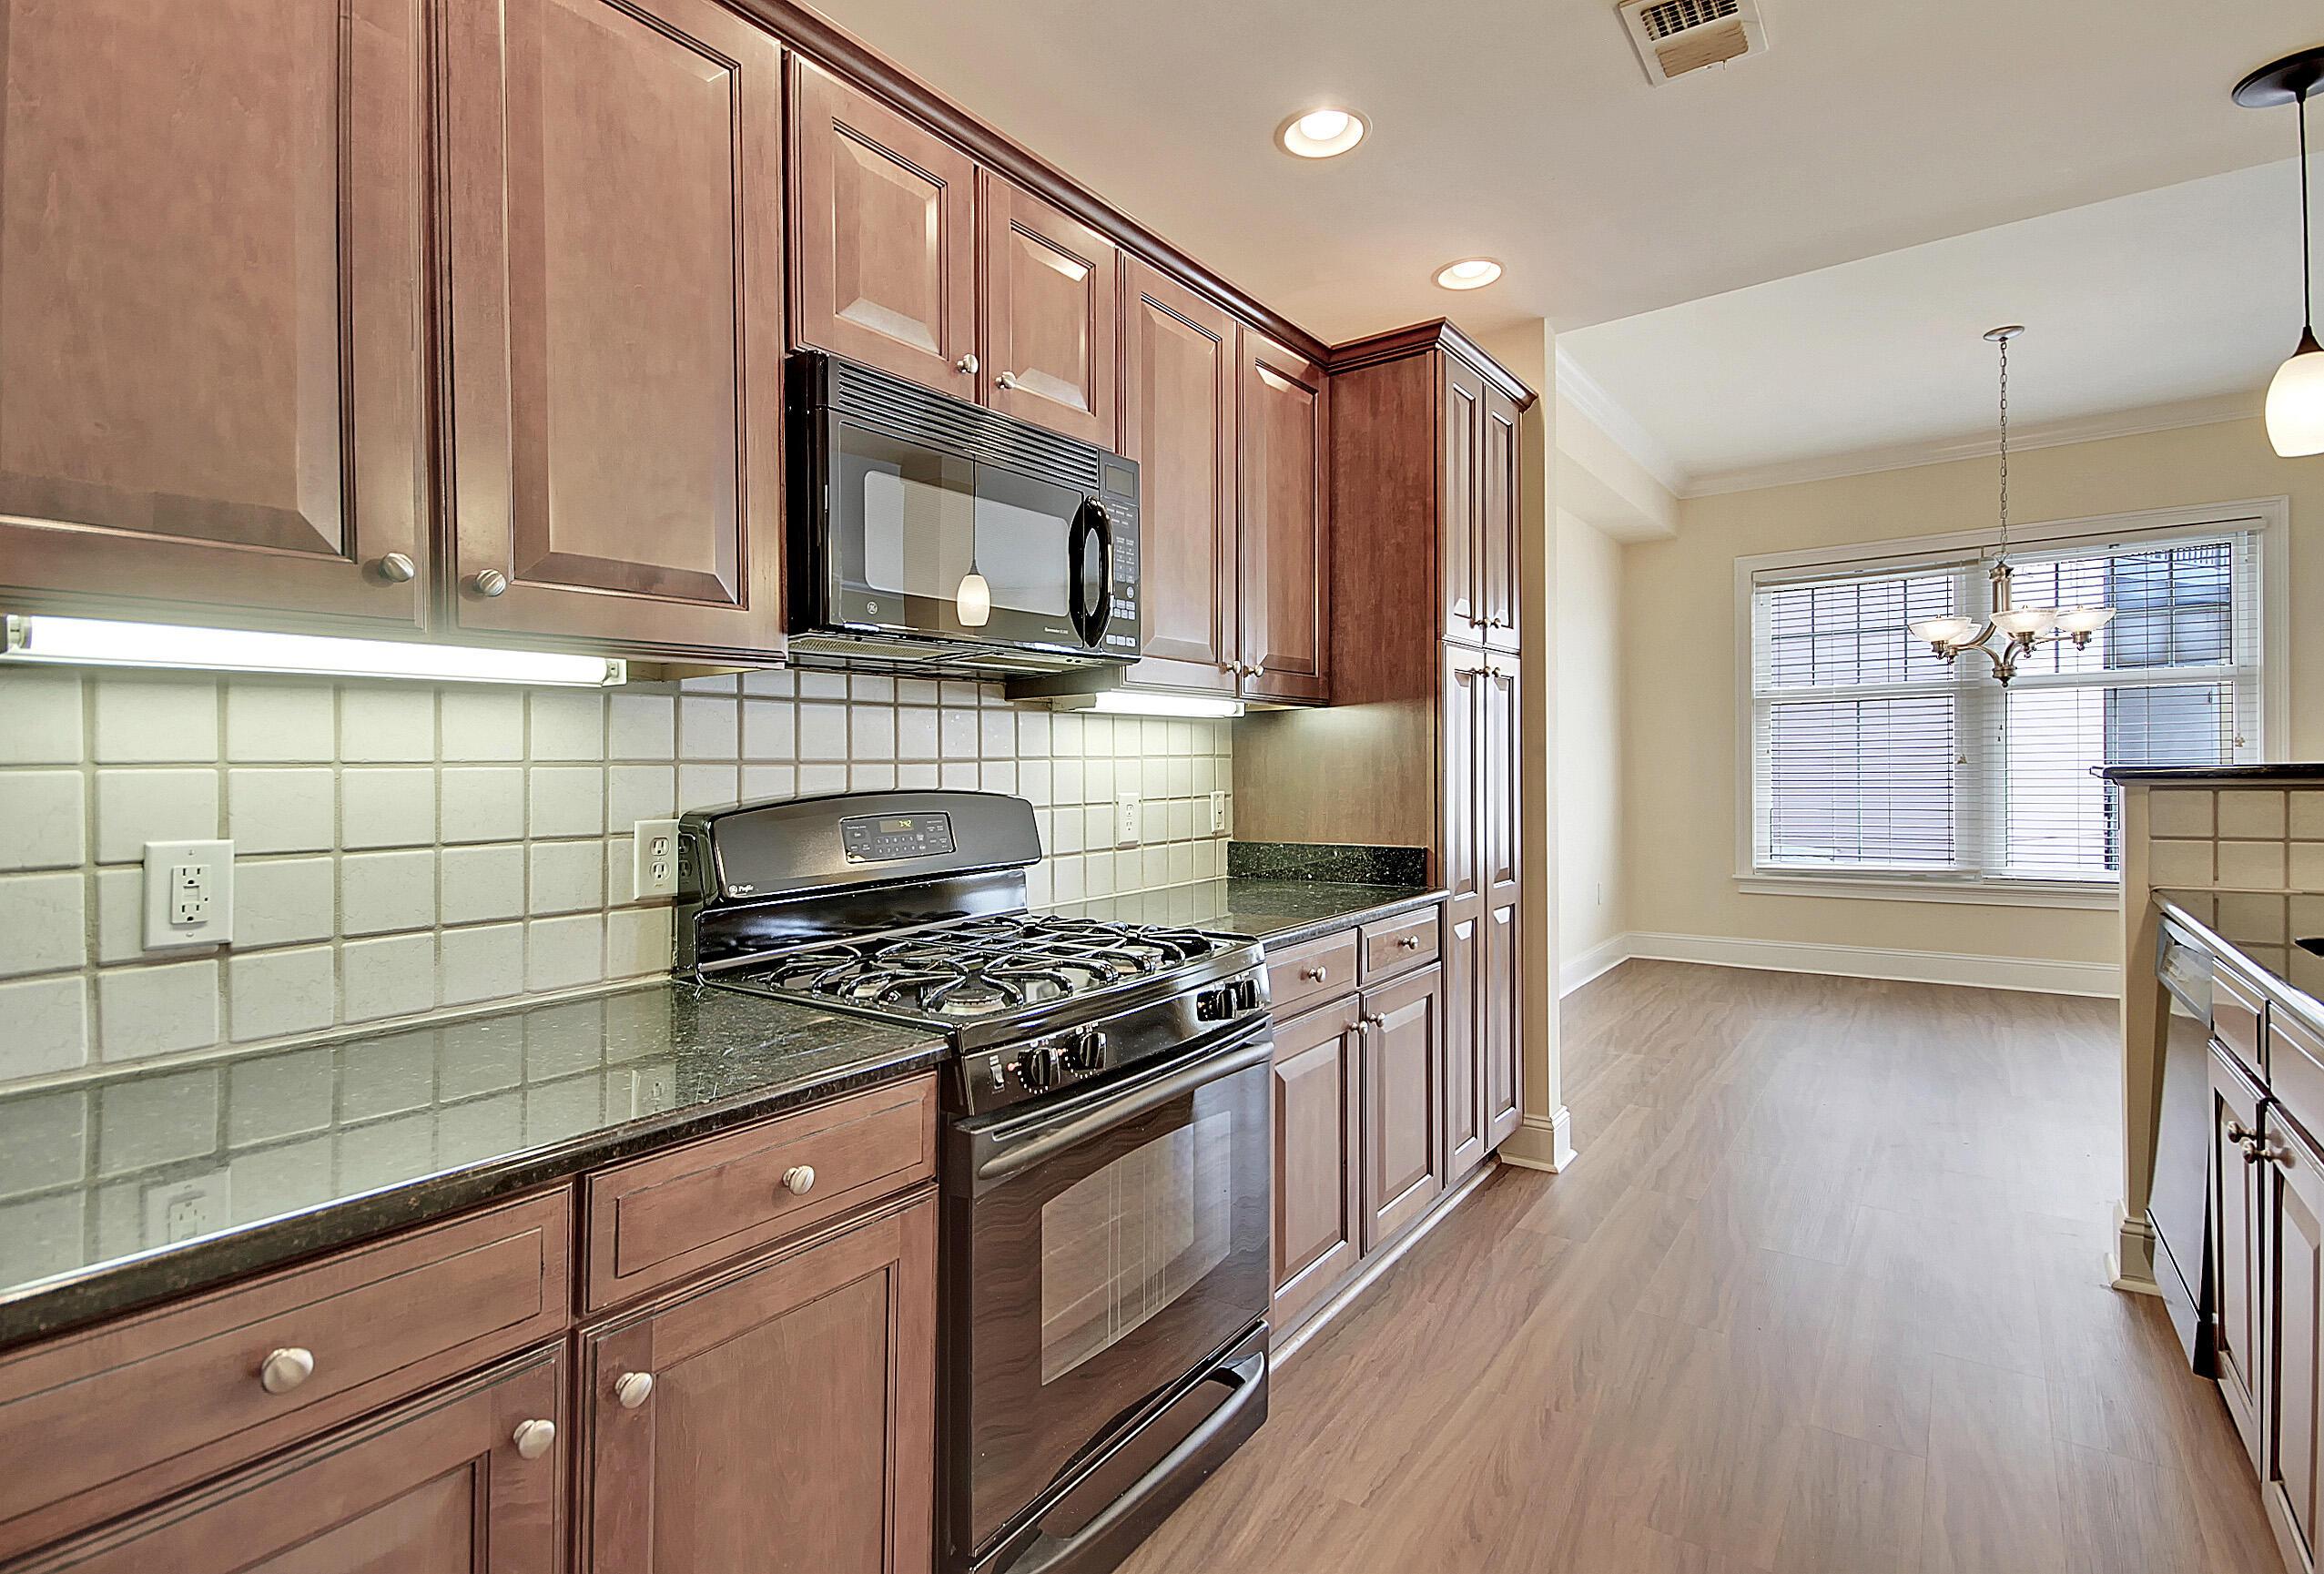 Albemarle Condos For Sale - 498 Albemarle, Charleston, SC - 22